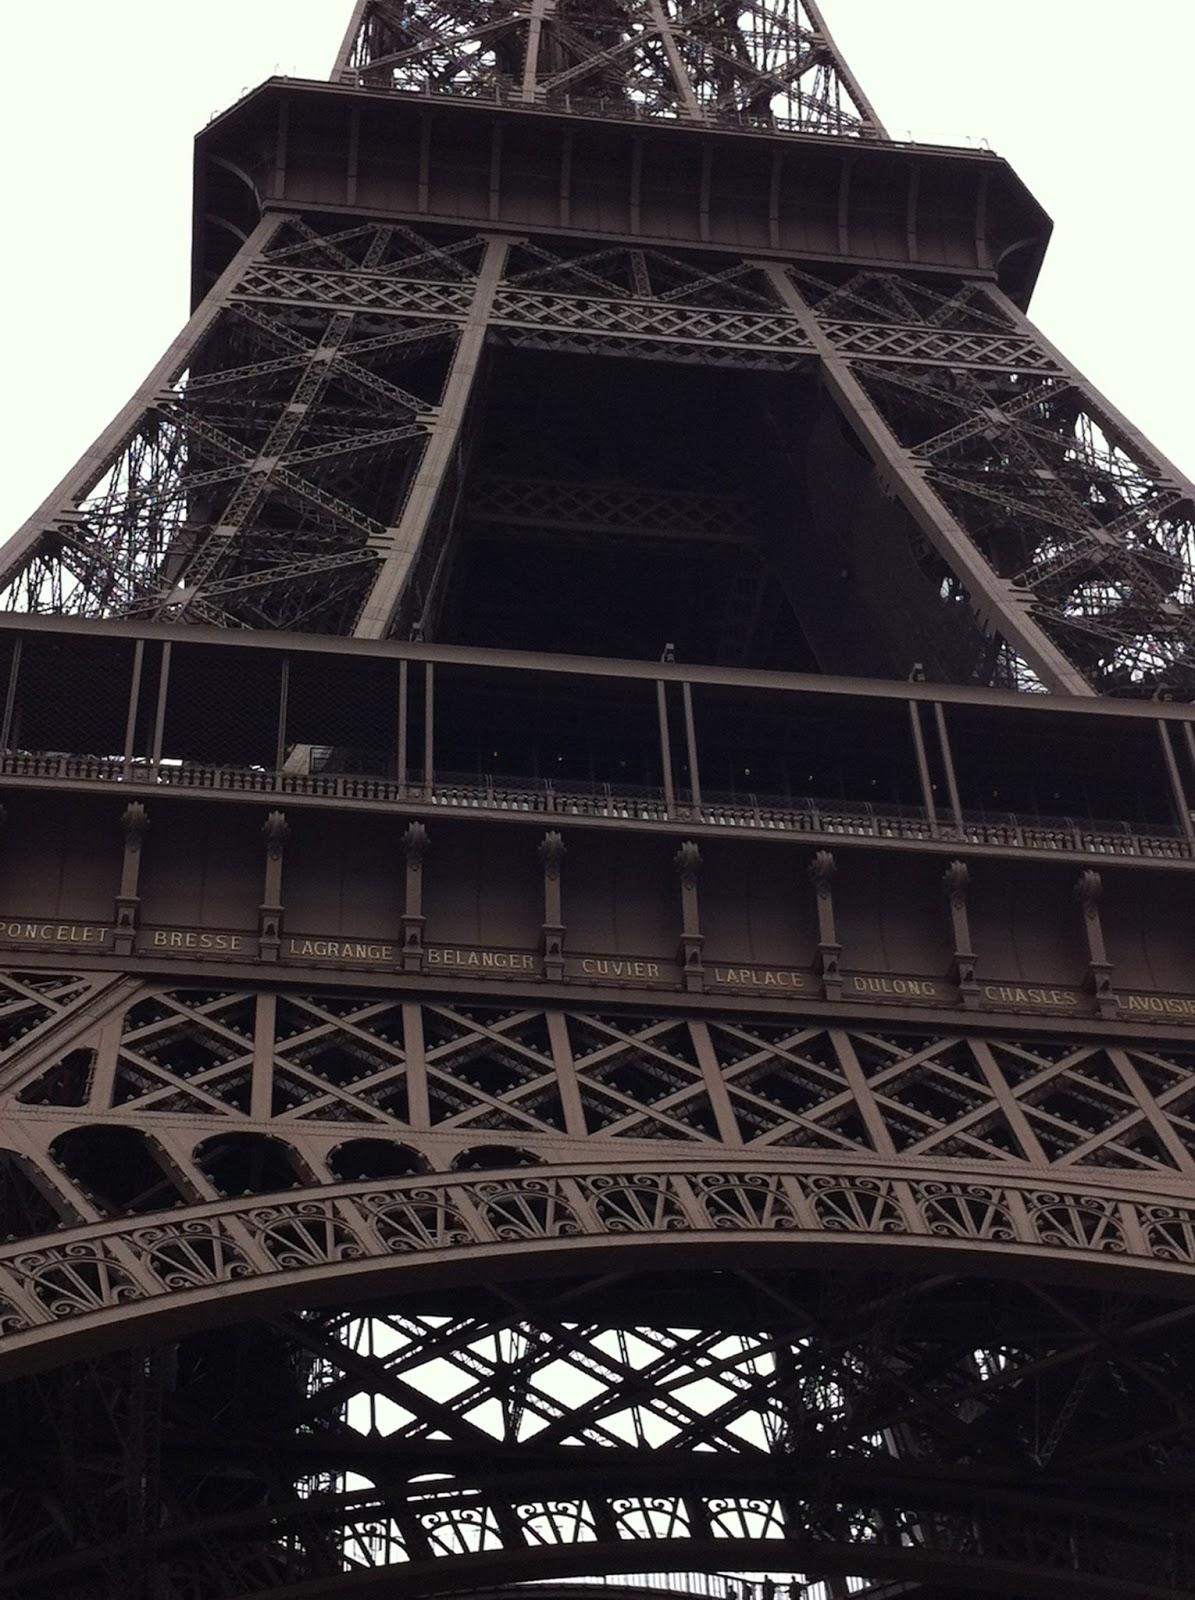 De tripas coraz n qui n no quiere subir a la torre eiffel for Quien hizo la torre eiffel